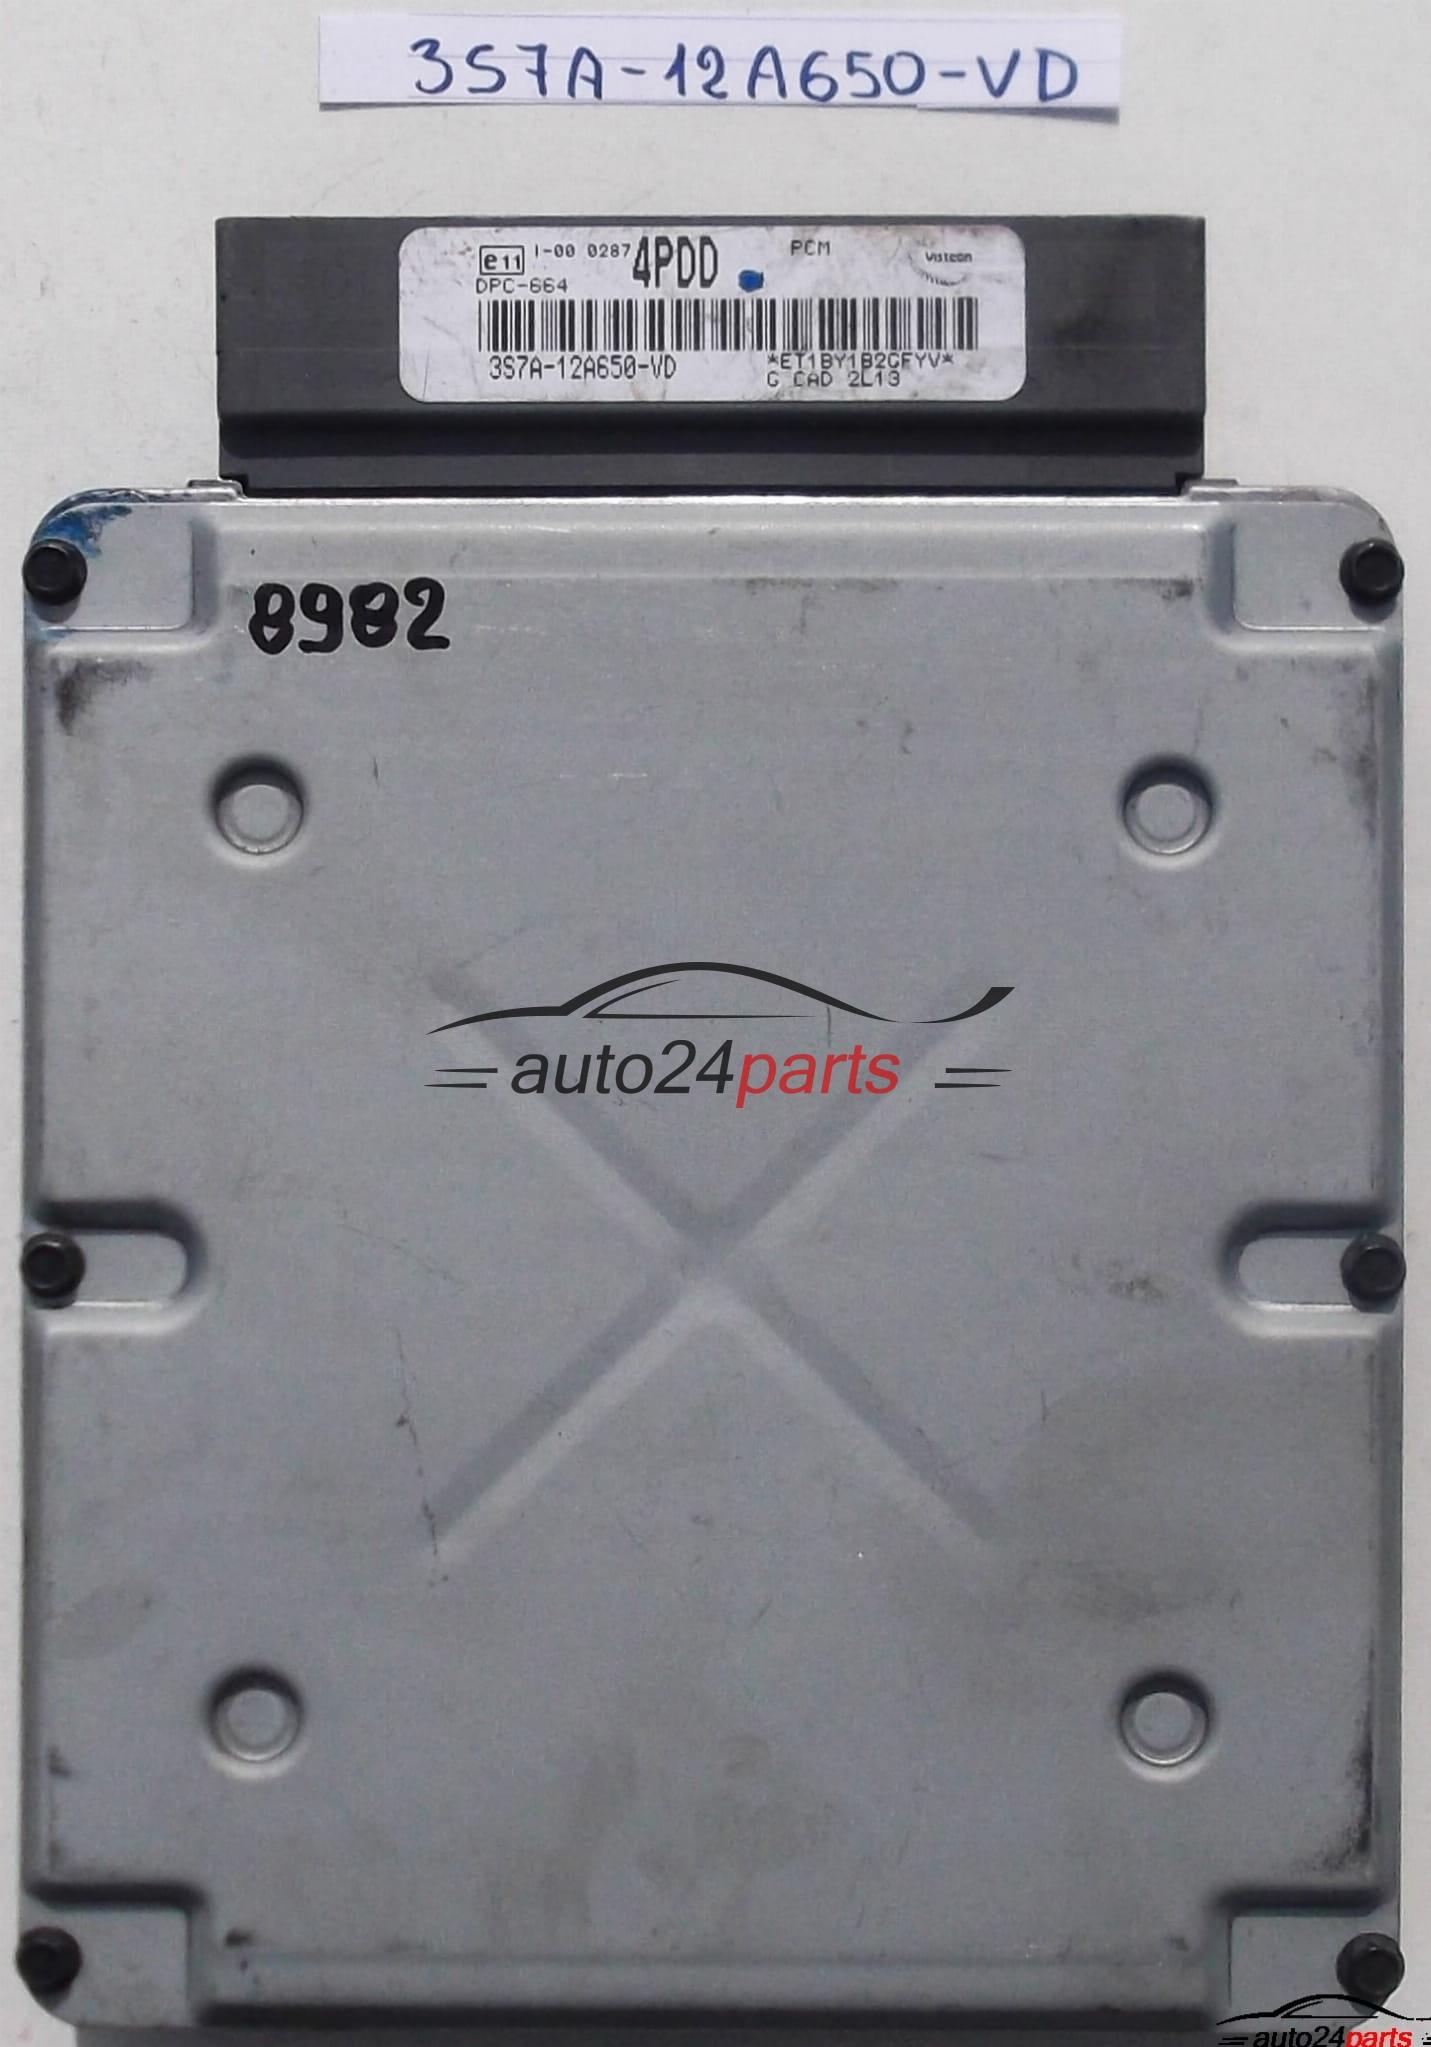 ECU ENGINE CONTROLLER FORD MONDEO MK3 2 0 TDCI VISTEON 3S7A-12A650-VD,  3S7A12A650VD, 4PDD